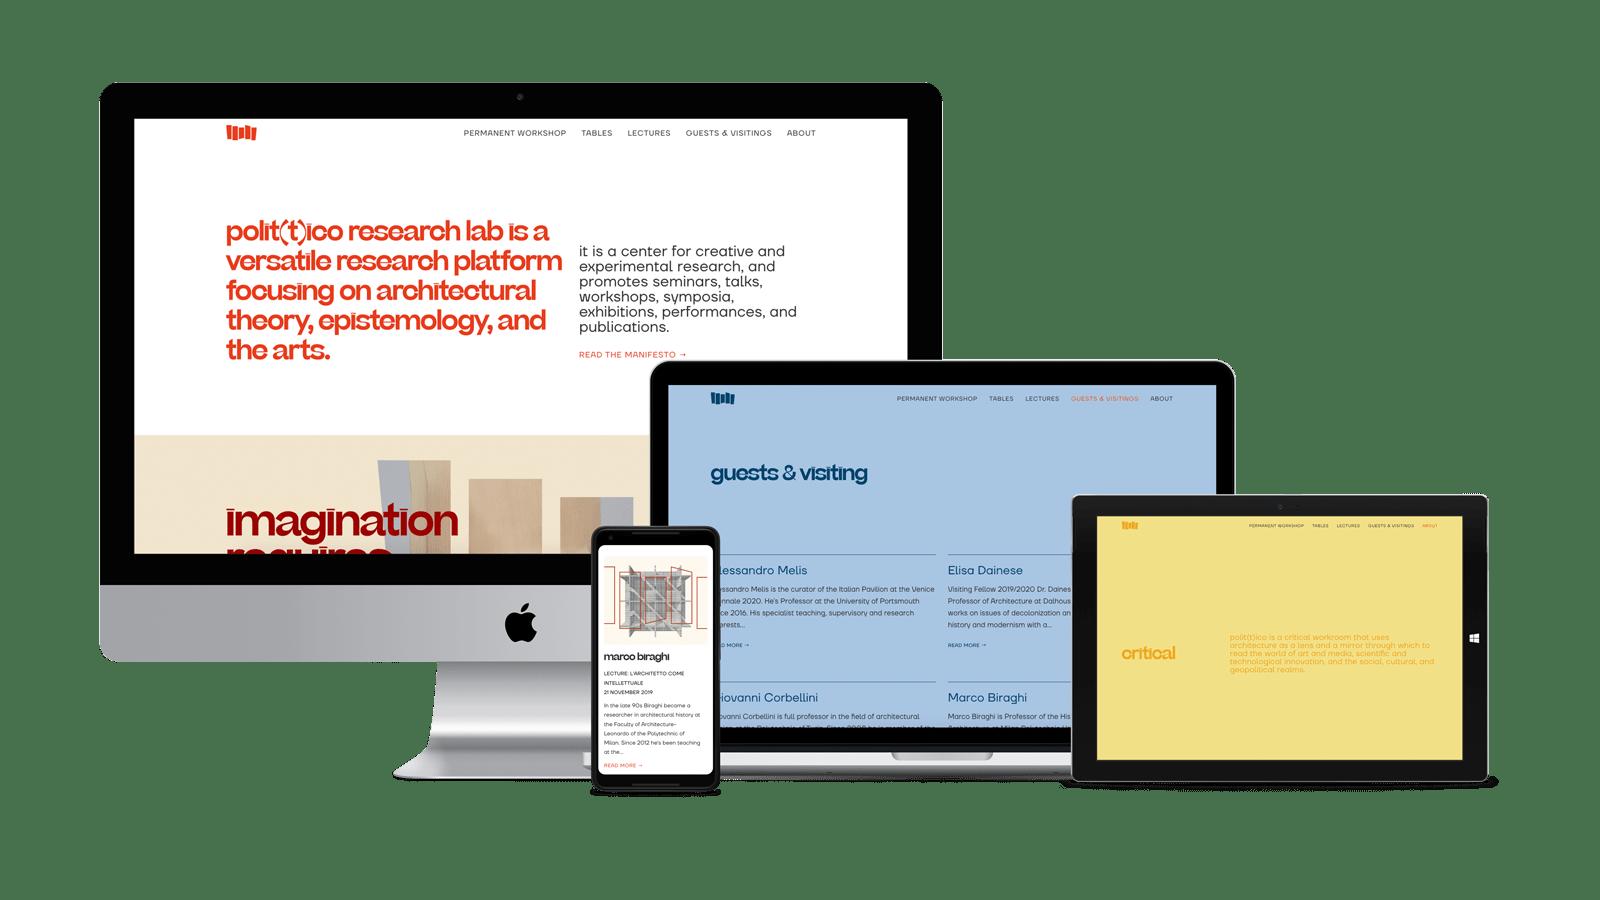 Polittico Research Lab website